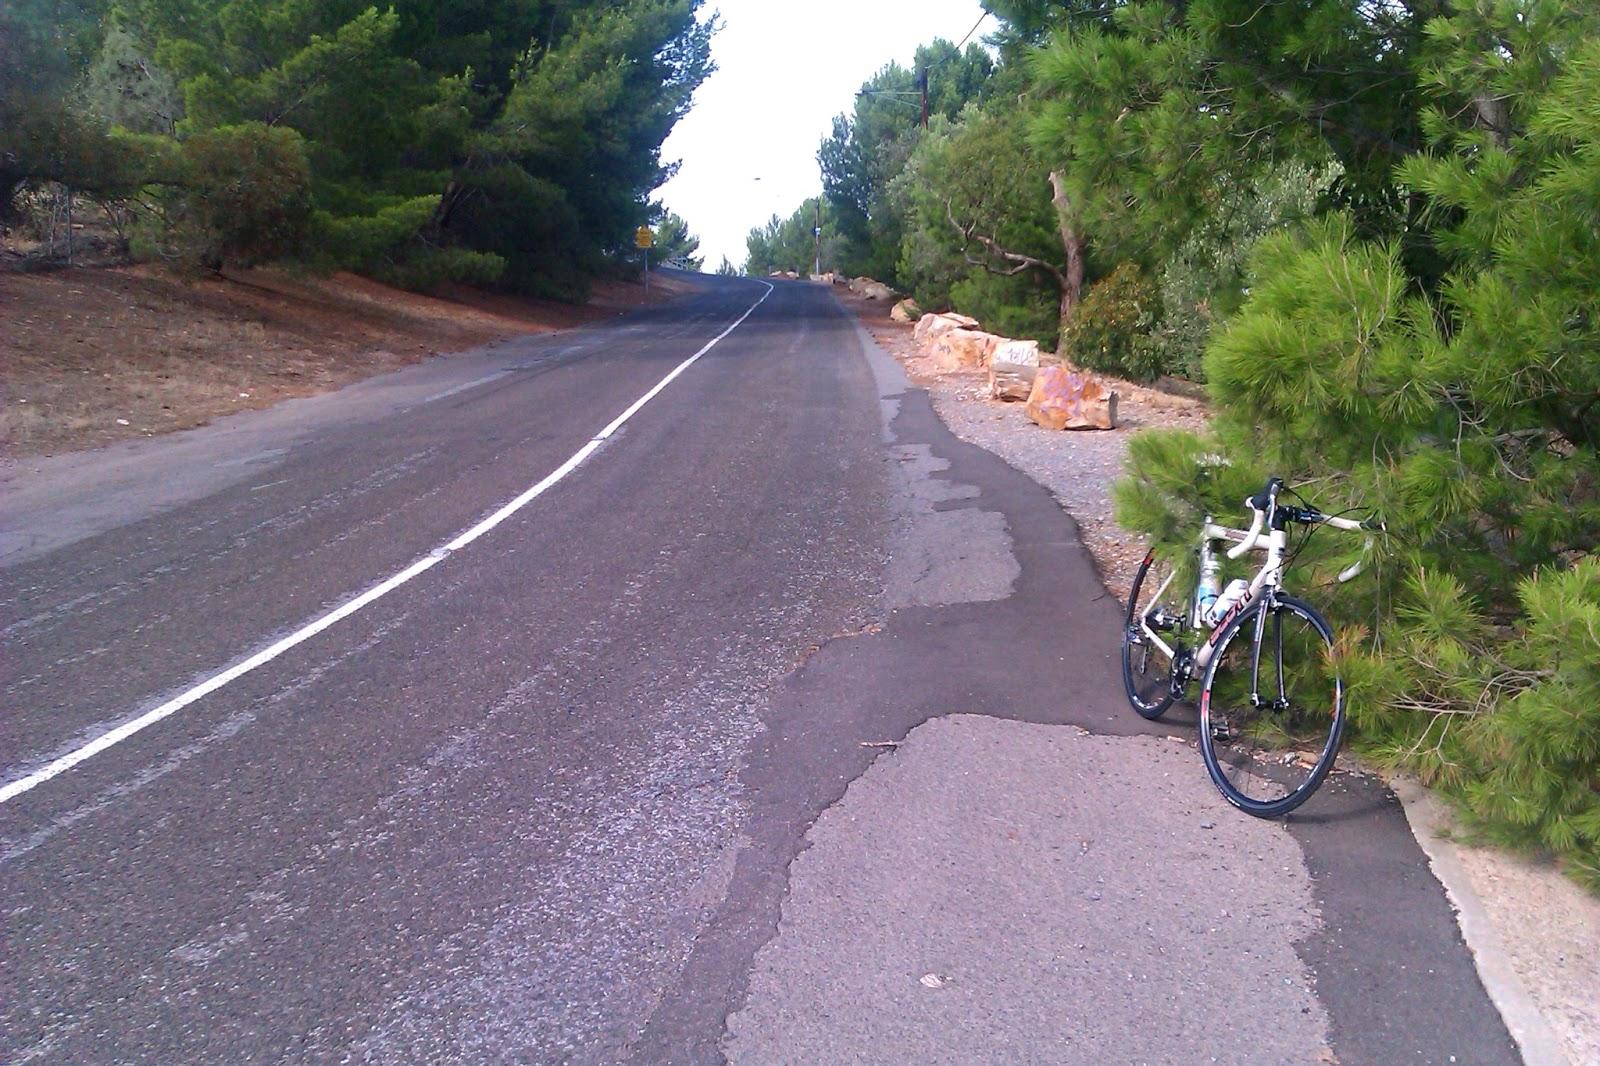 Image via Graeme's Bike Blog